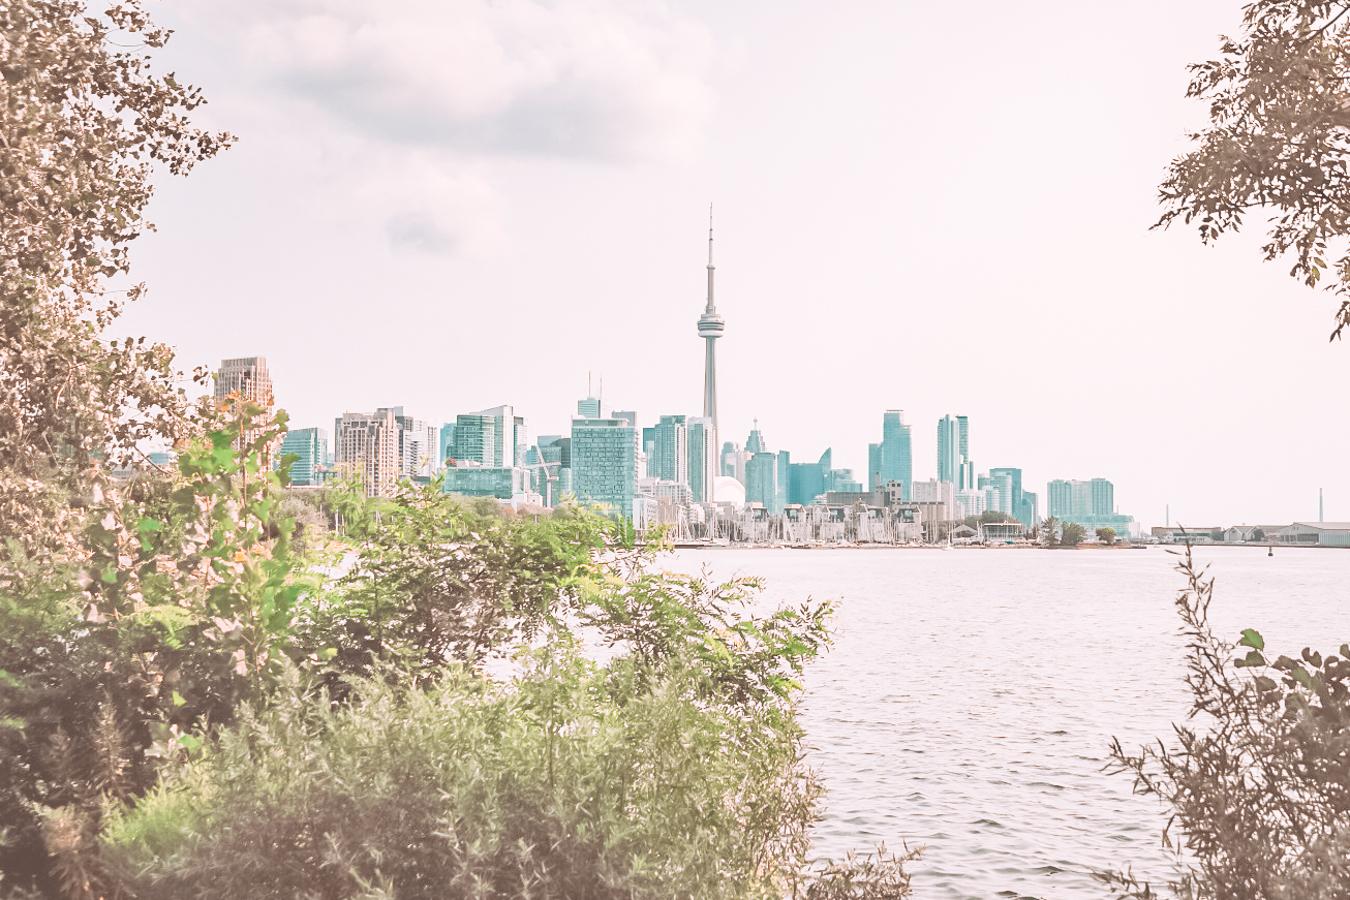 Toronto and trees